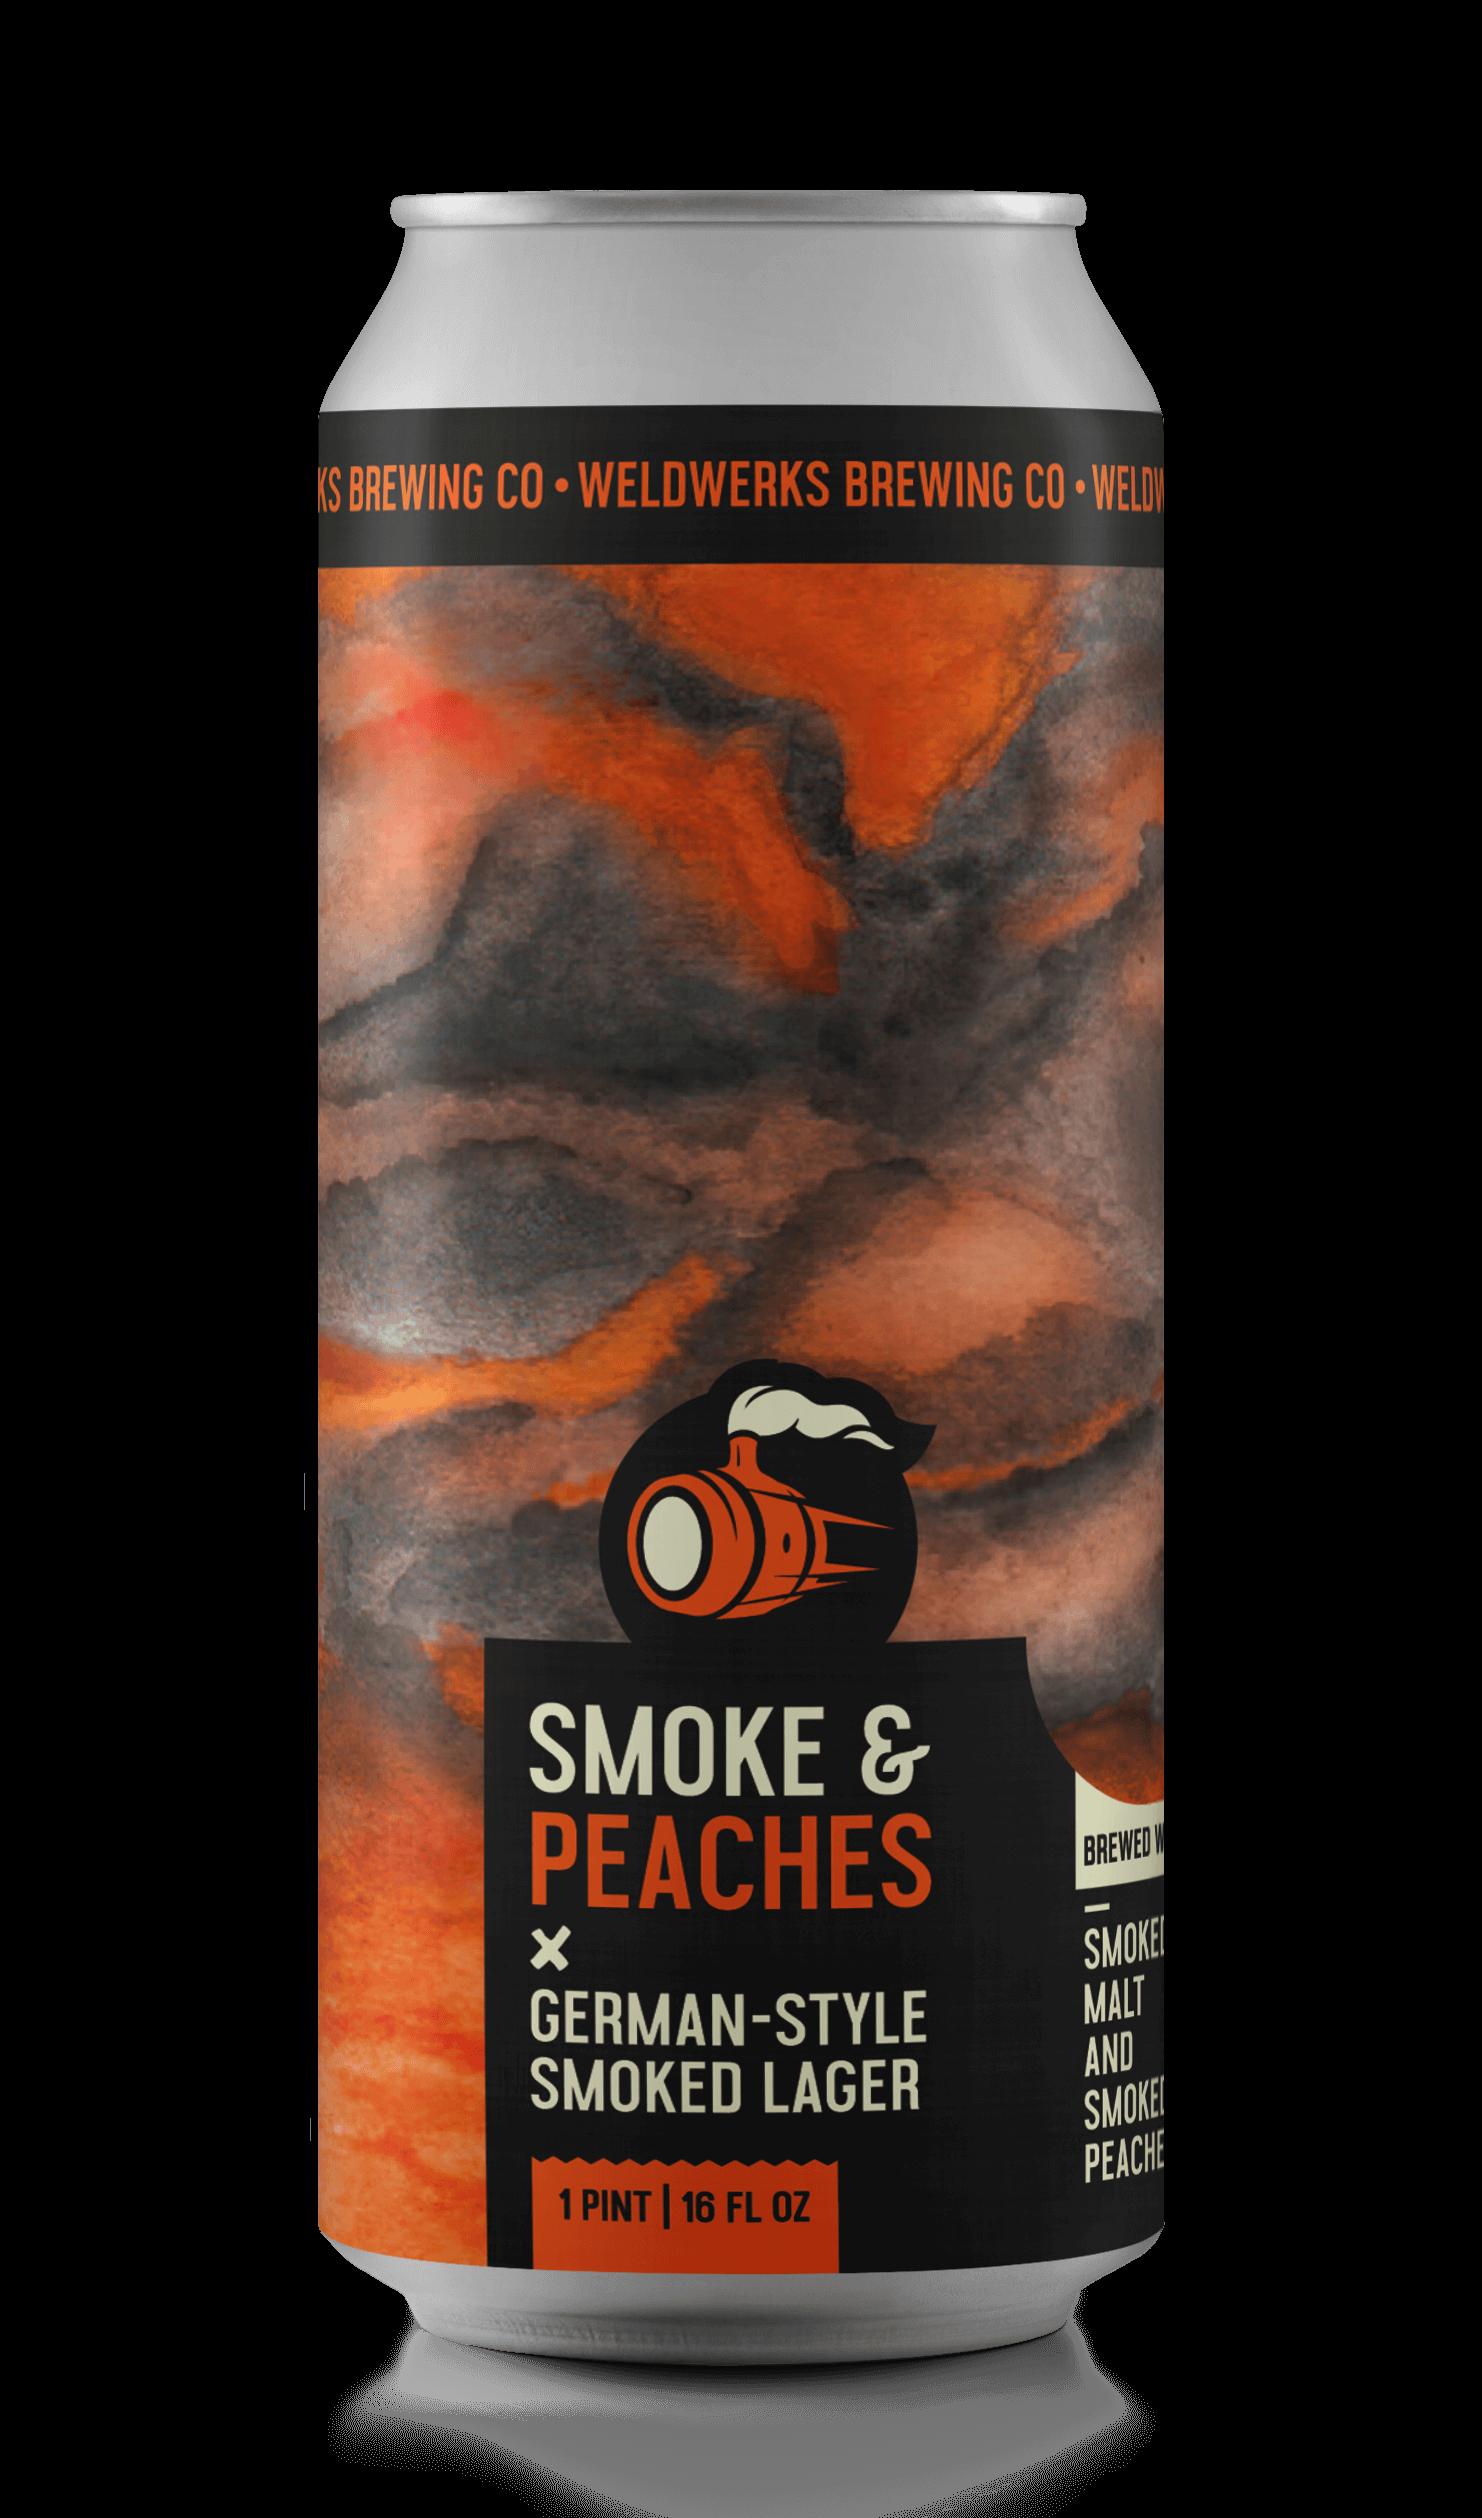 Smoke & Peaches